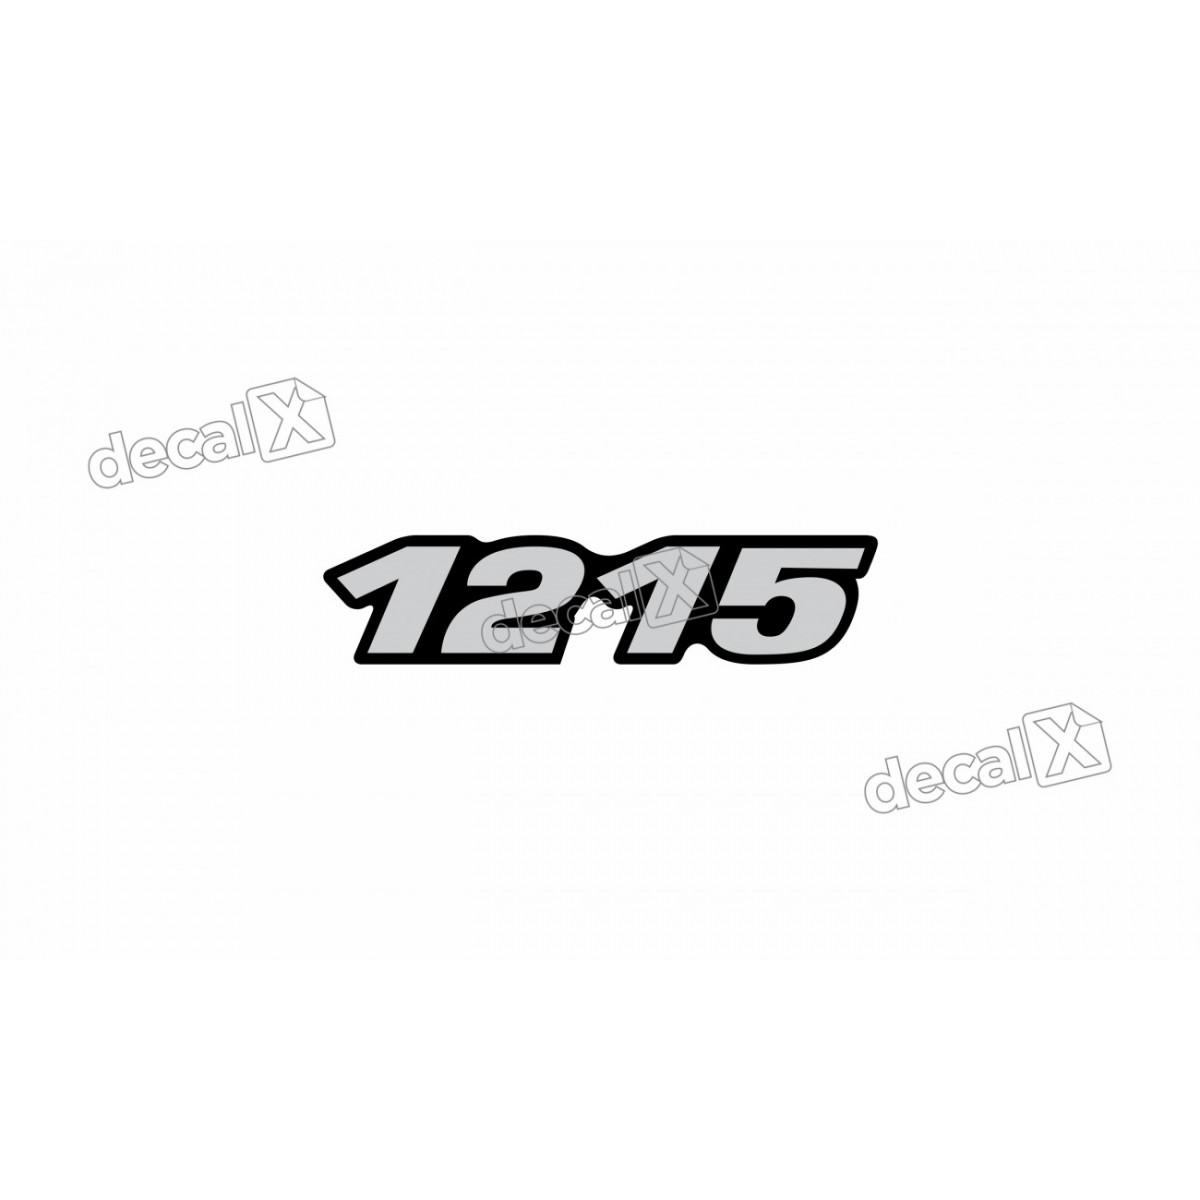 Adesivo Emblema Resinado Mercedes 1215 Cm21 Decalx